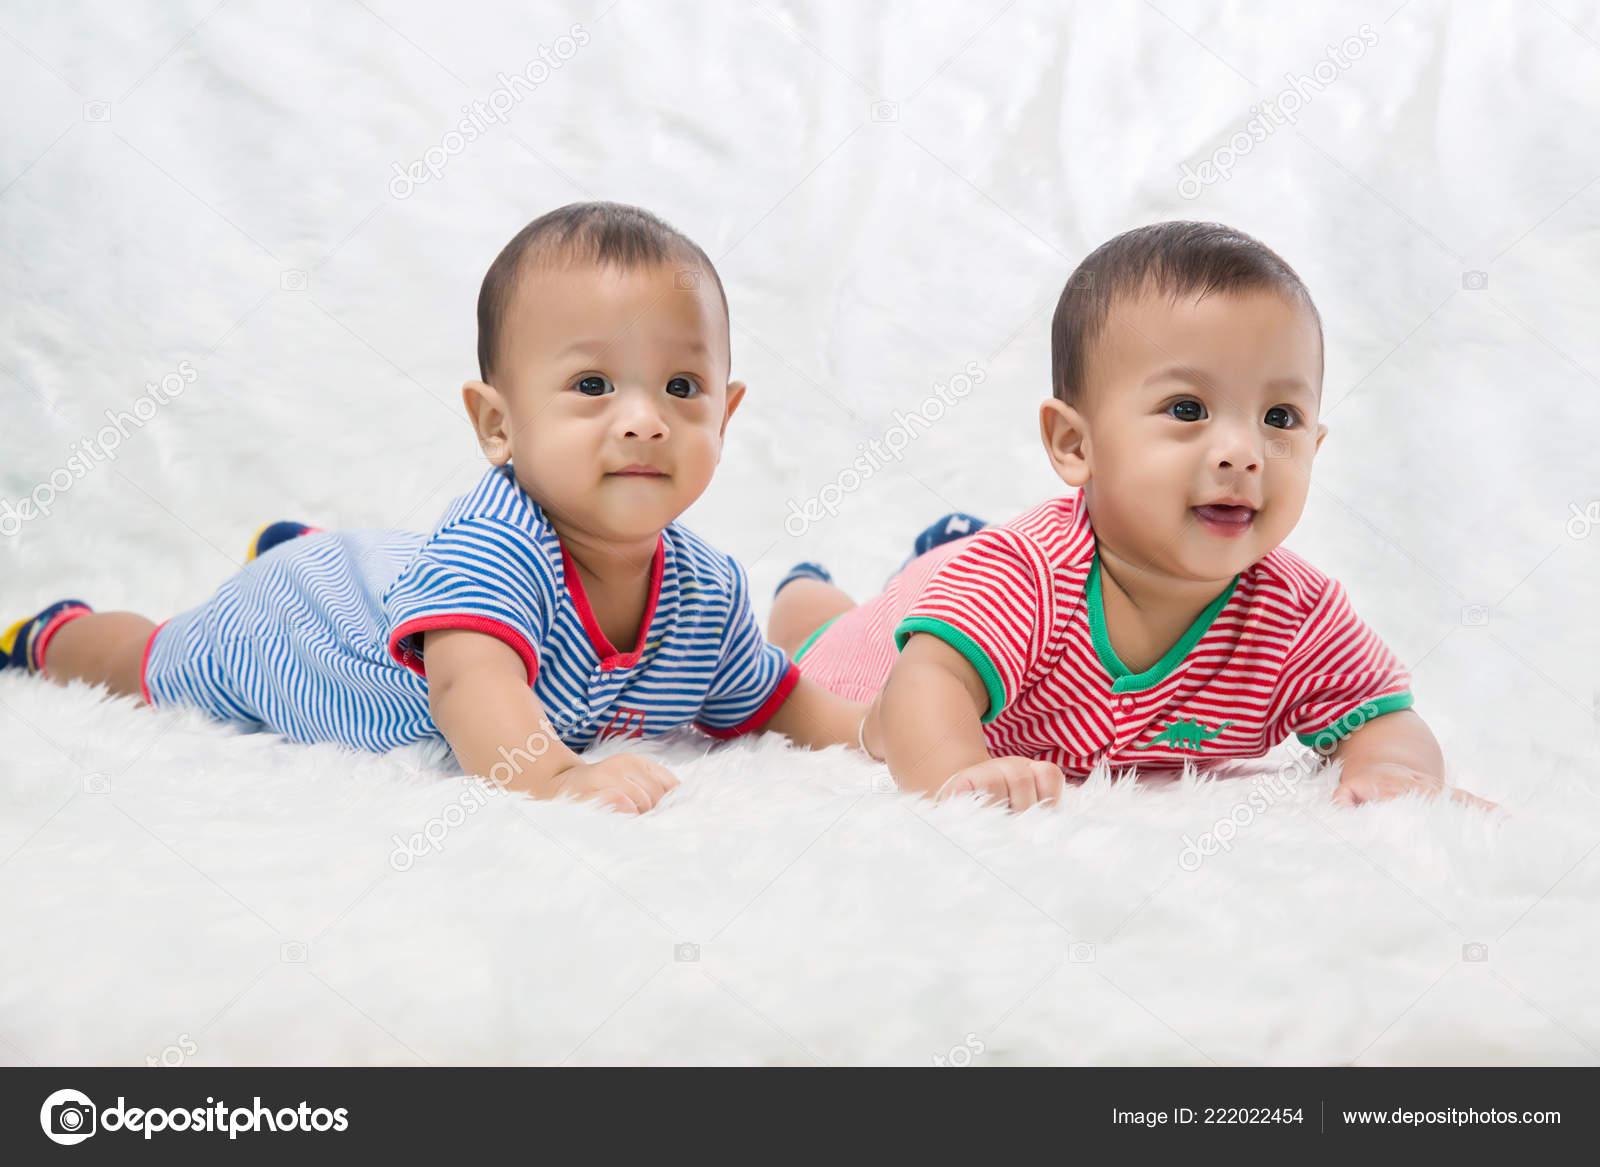 Infant Twins Sleeping Newborn Babies Twins Sleep Bed Lovely Sleep Stock Photo C Kckate16 Gmail Com 222022454